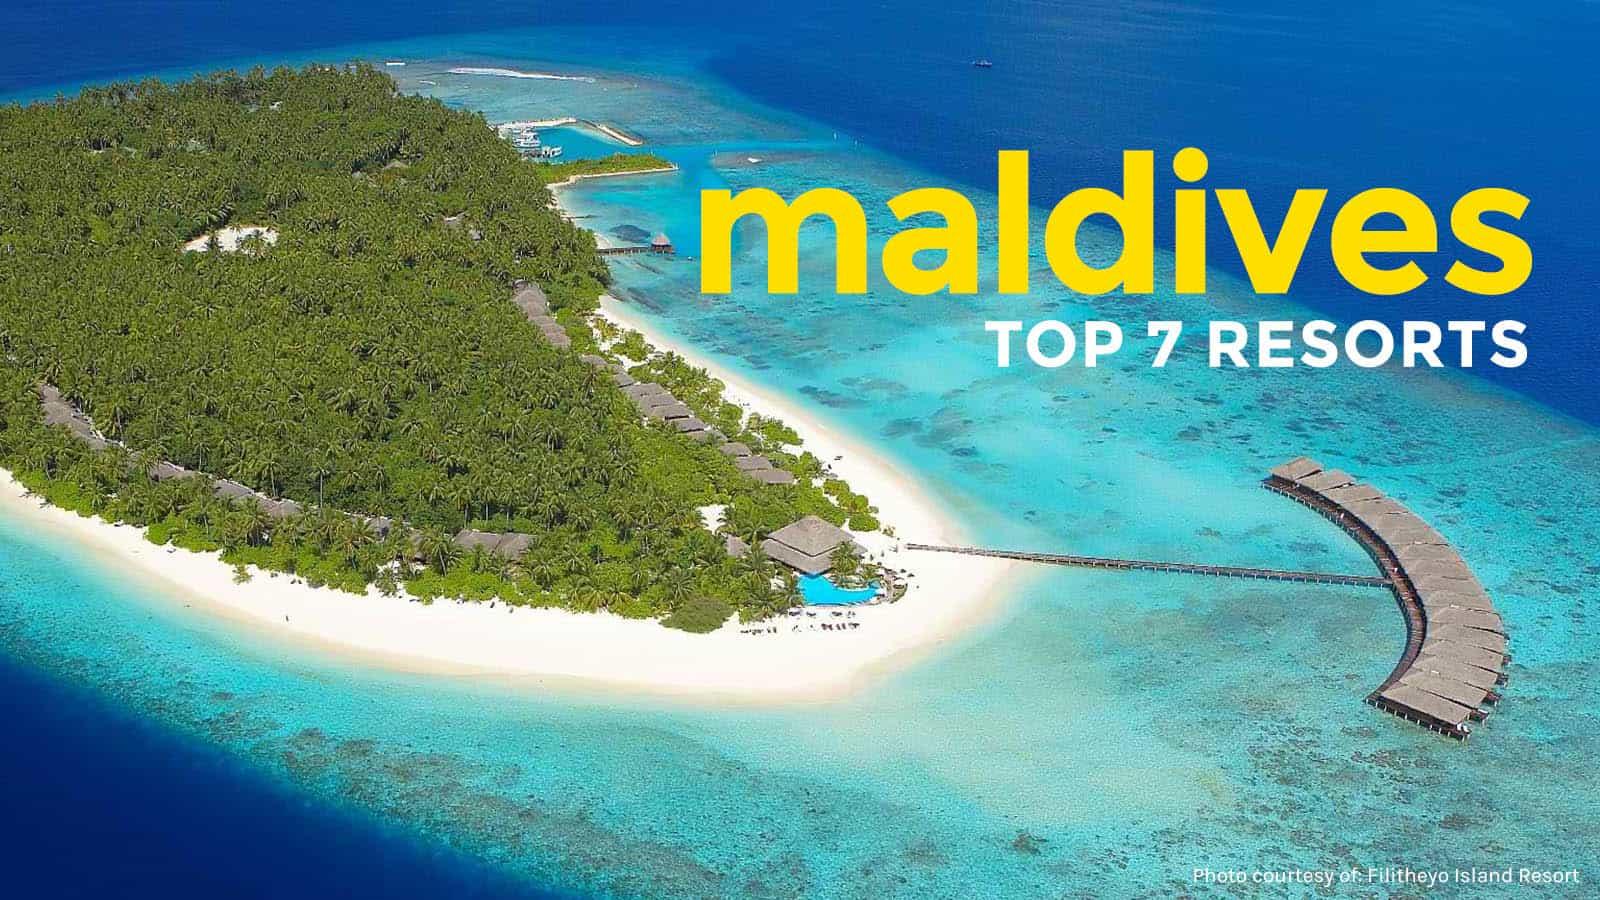 Maldives Top 7 Resorts Under 200 The Poor Traveler